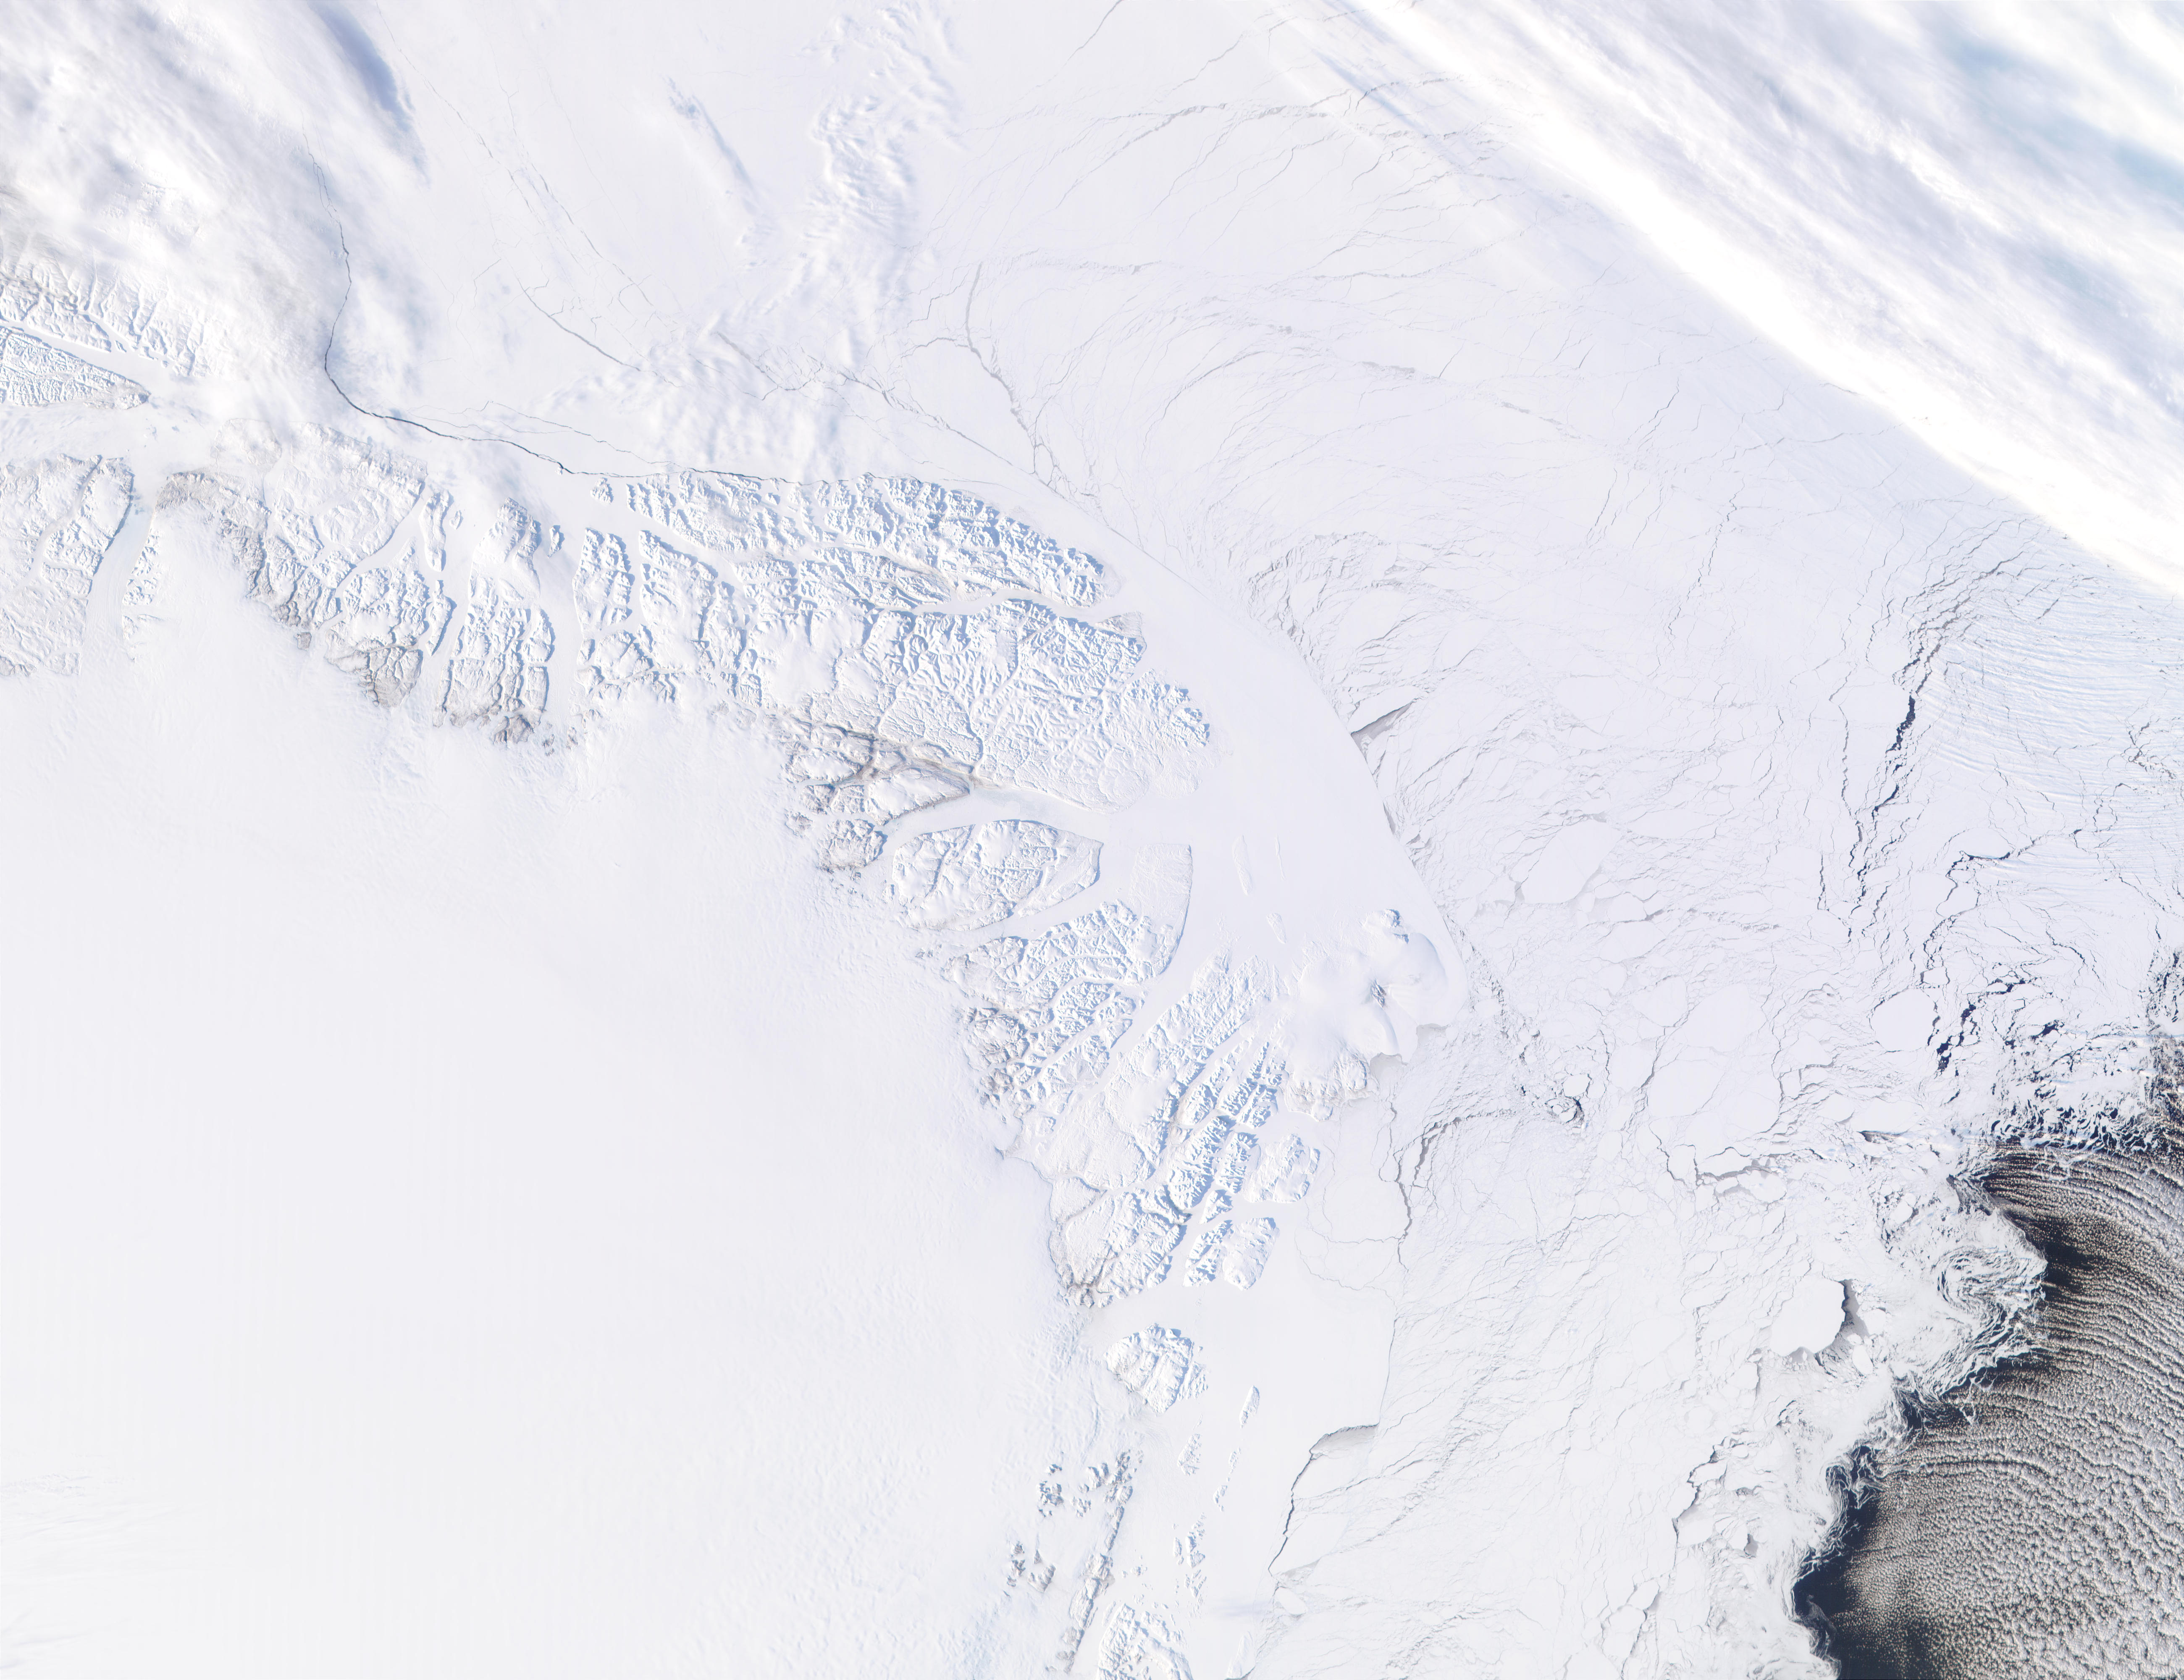 Tierra de Peary, norte de Groenlandia